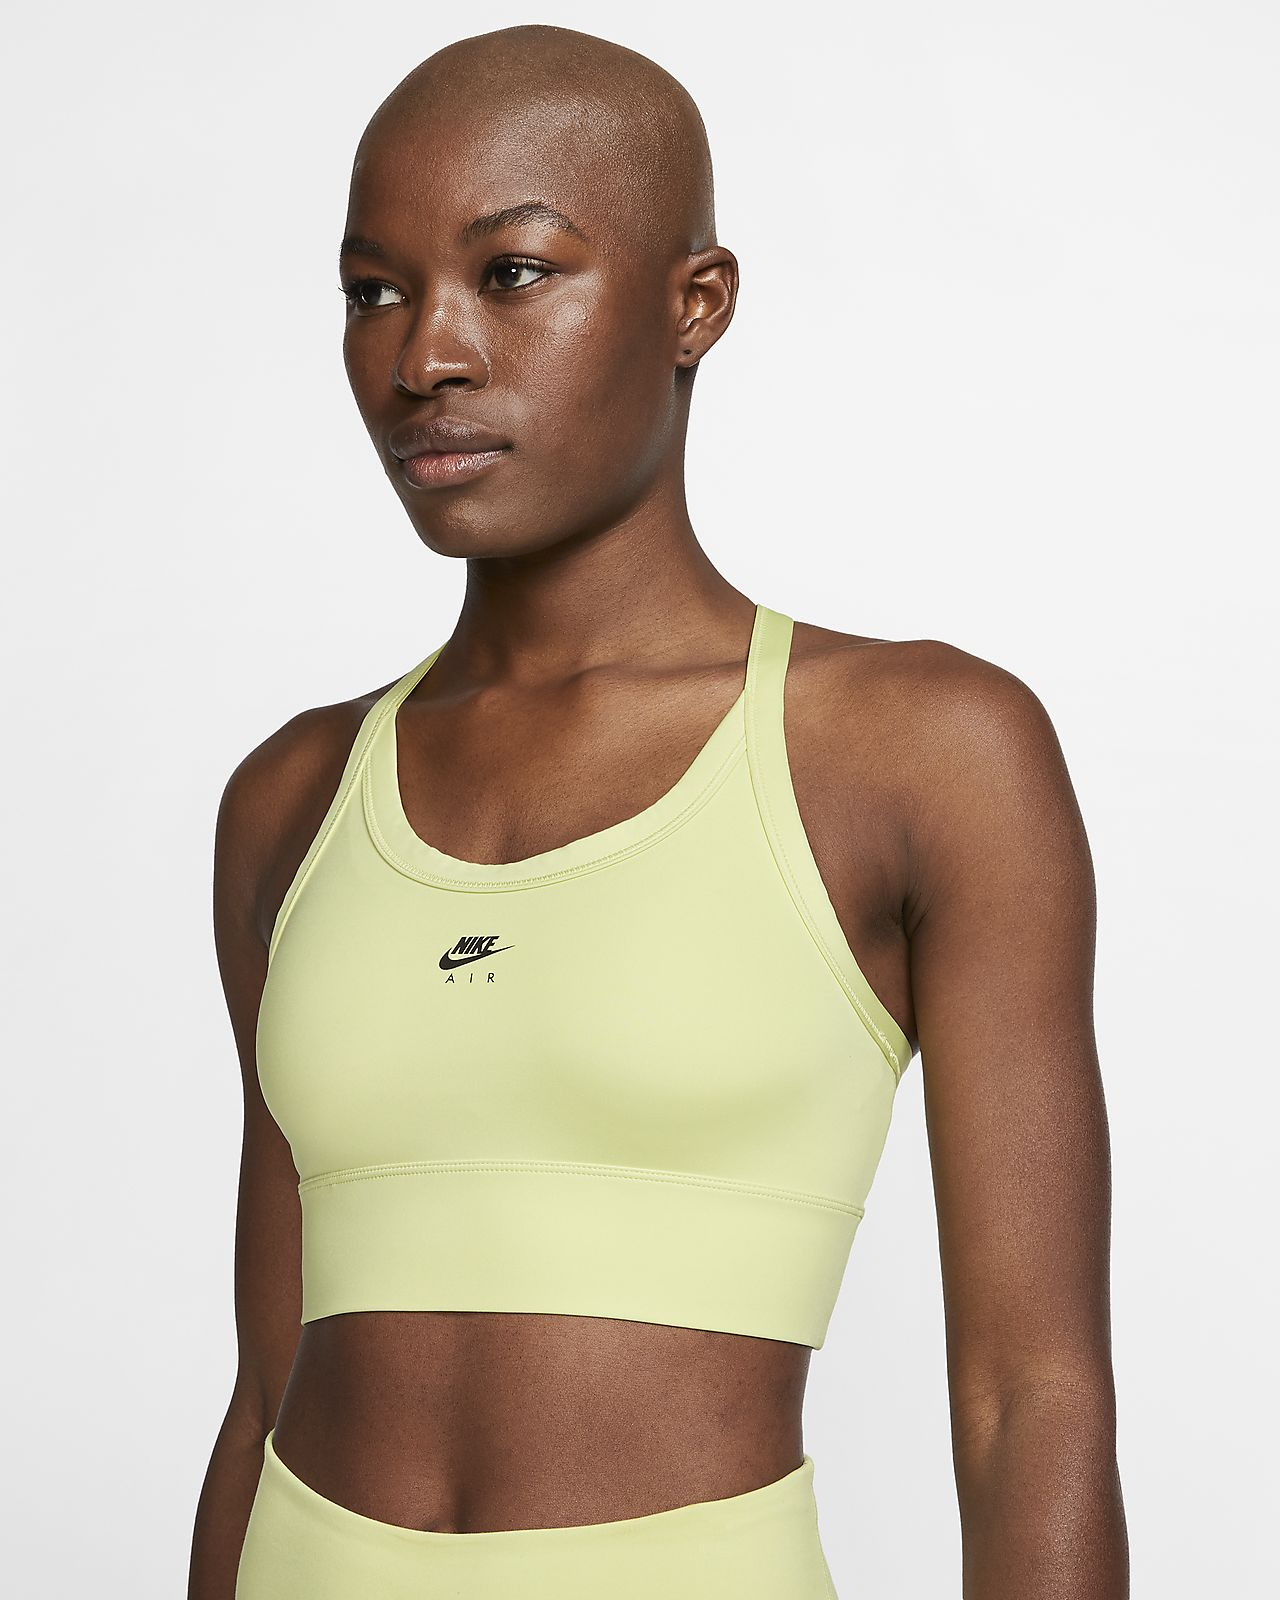 Nike Air Swoosh Women's Medium-Support 1-Piece Pad Sports Bra